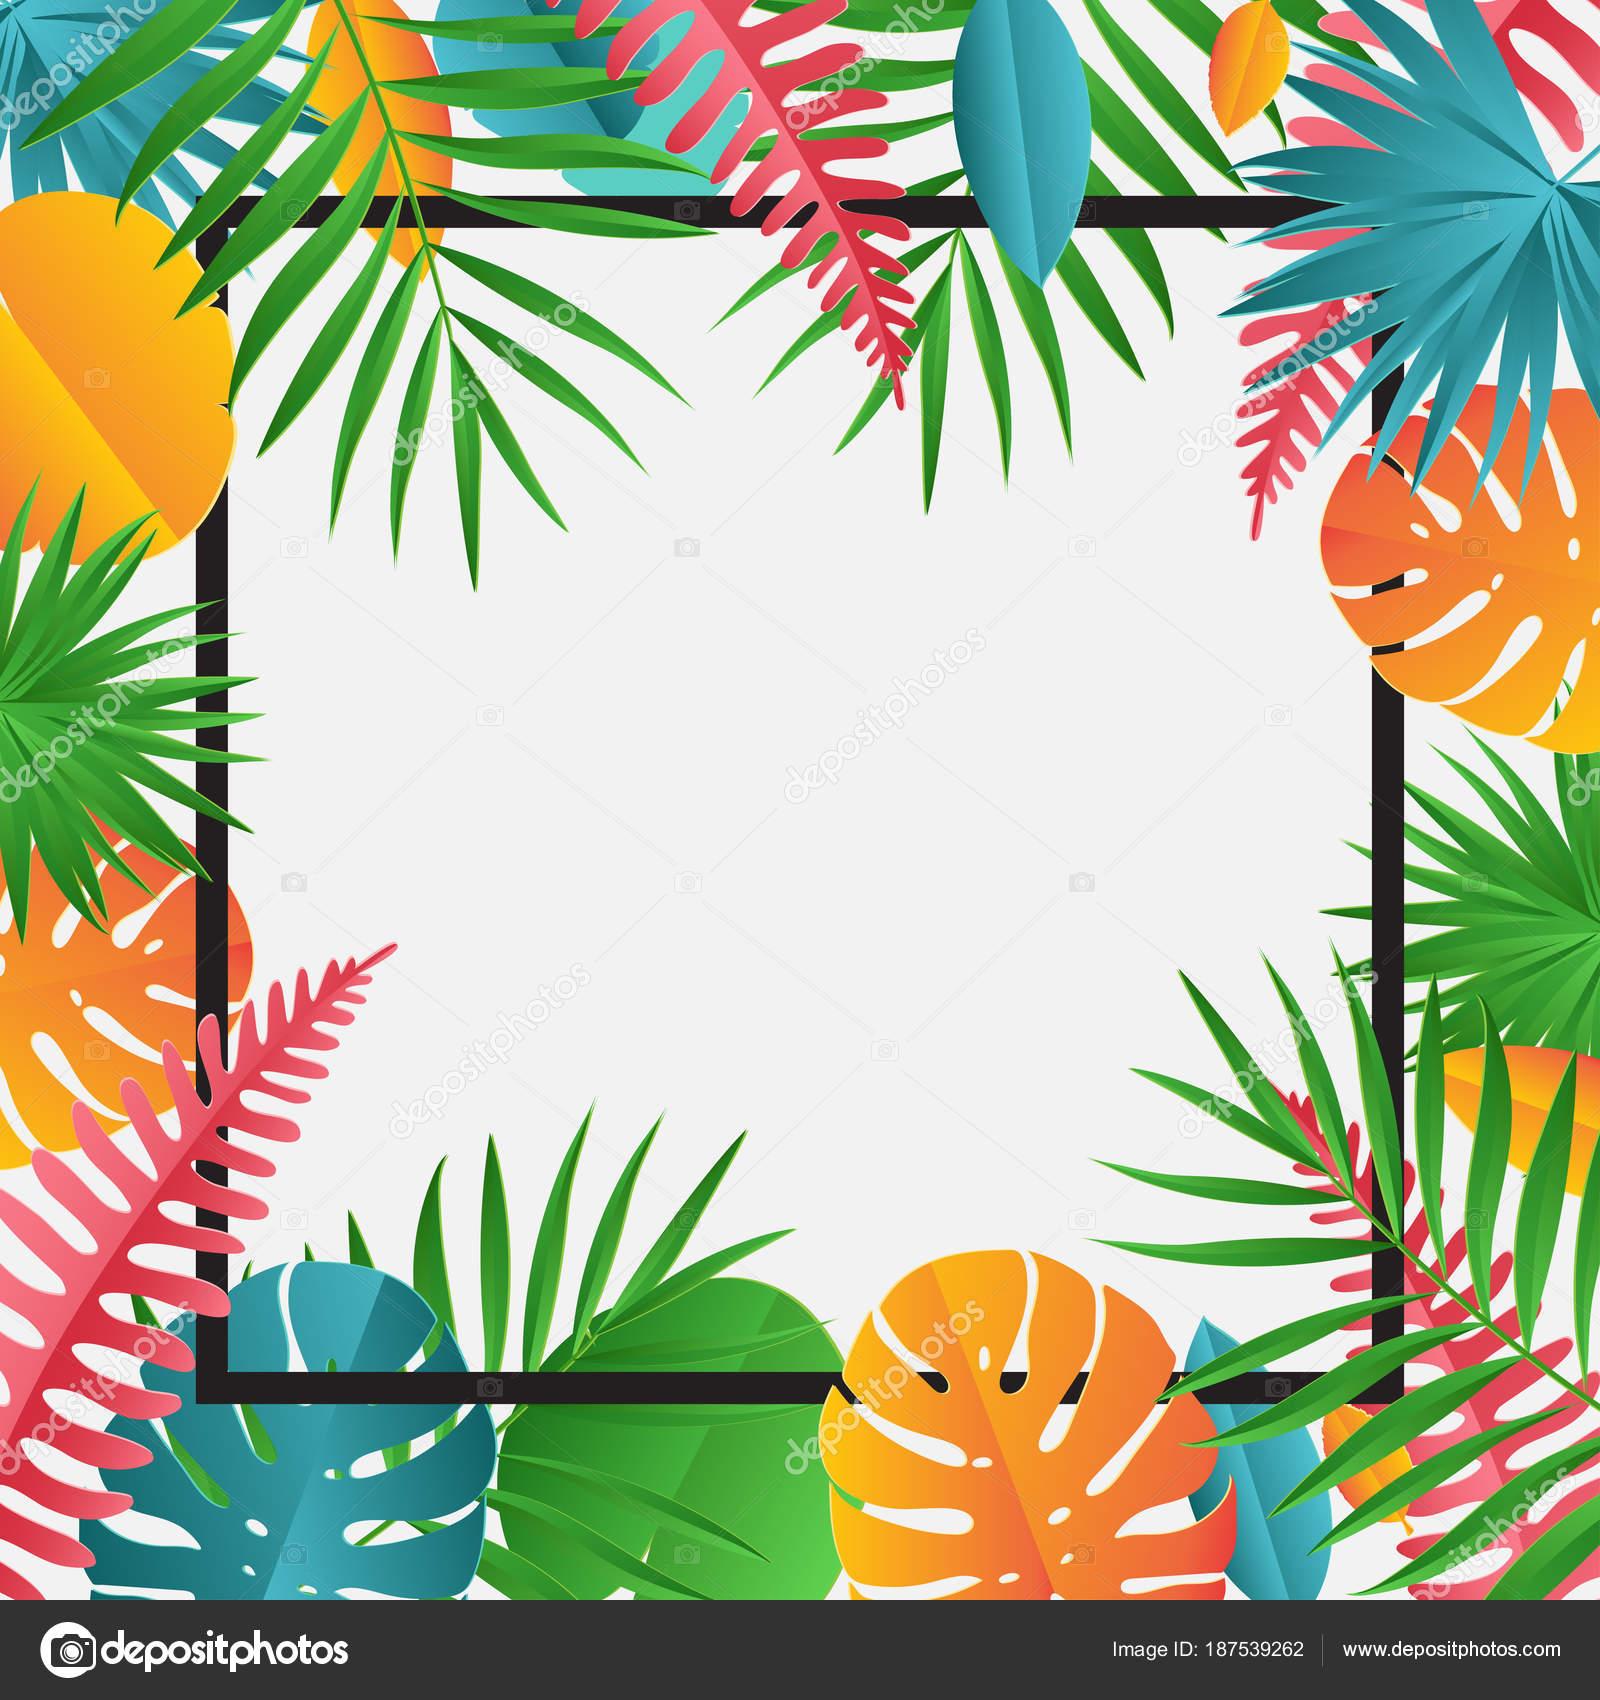 papier tropical monstera feuilles cadre image. Black Bedroom Furniture Sets. Home Design Ideas